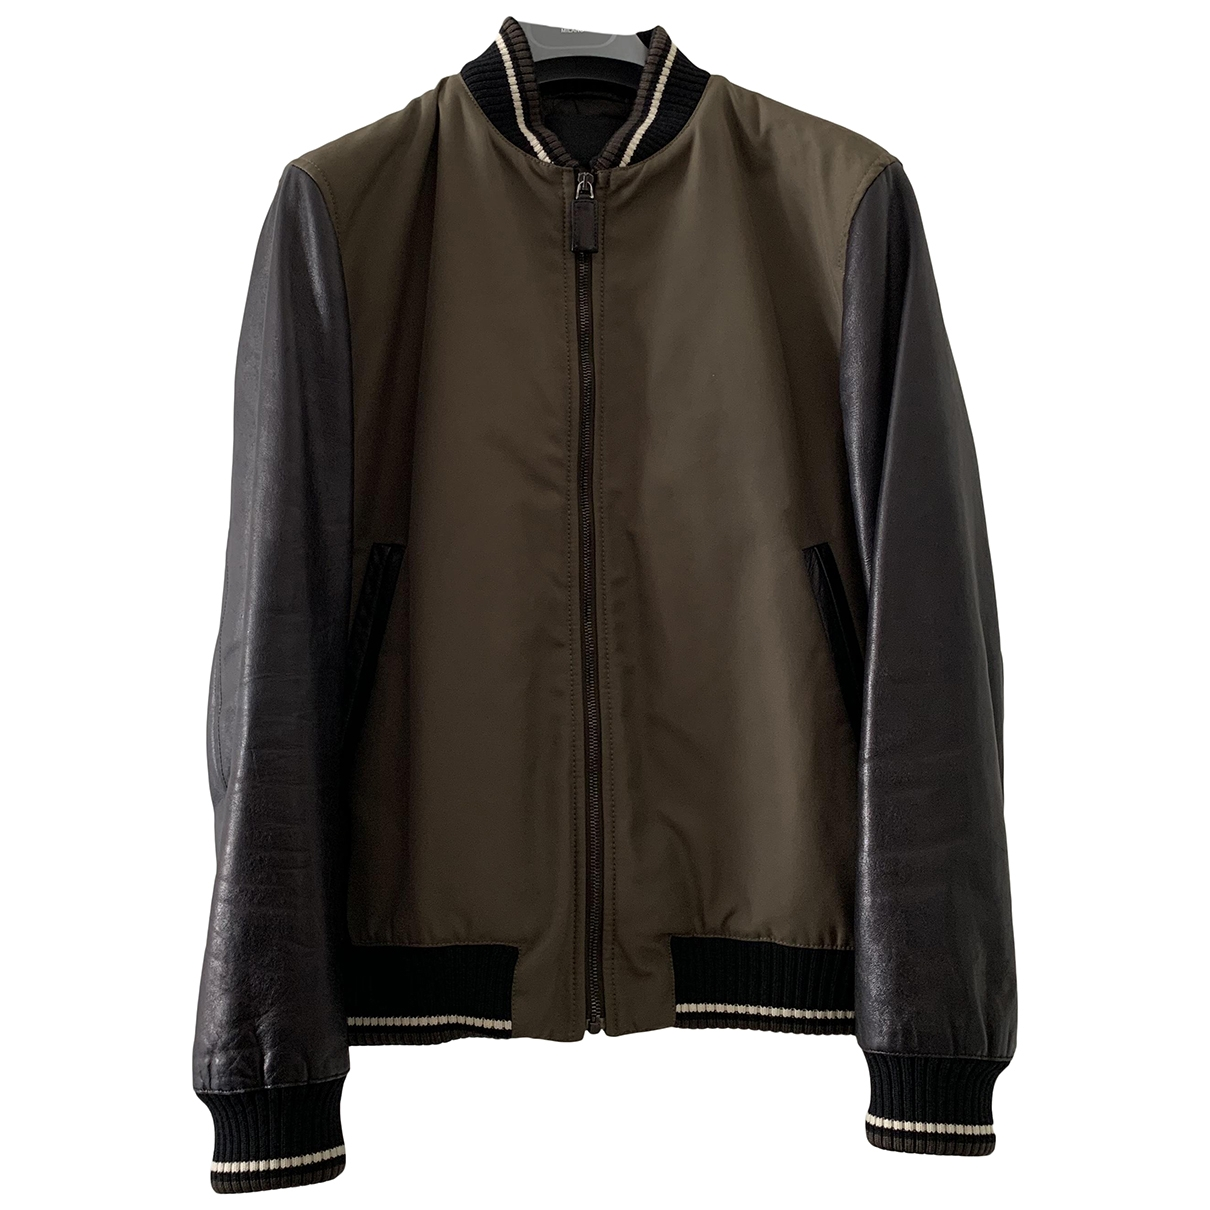 Prada \N Multicolour jacket  for Men 48 IT